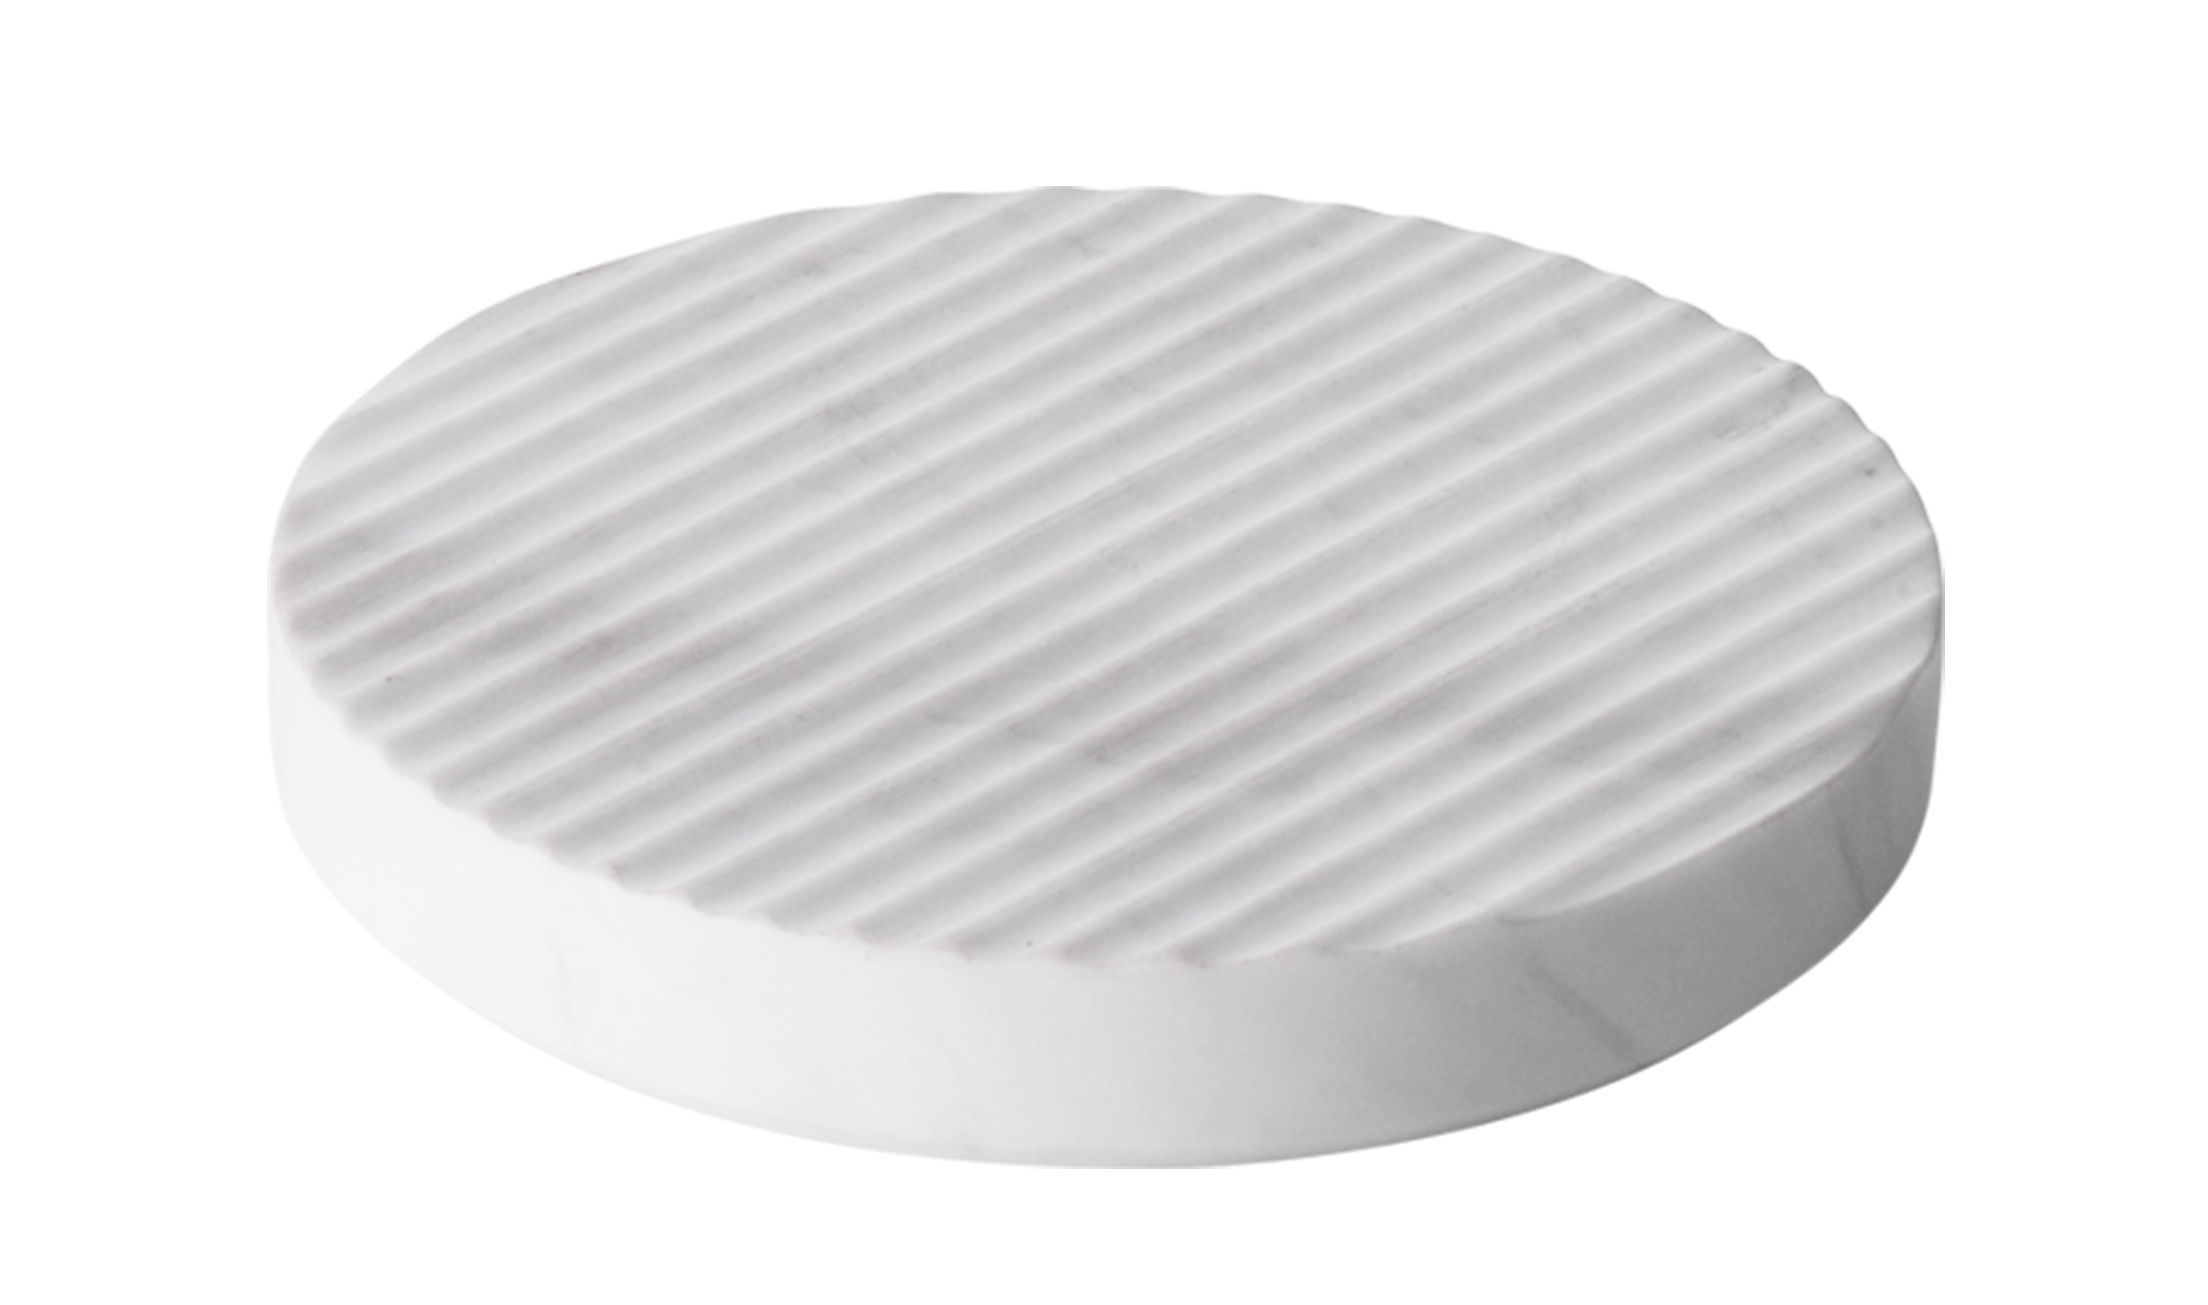 Arts de la table - Dessous de plat - Dessous de plat Groove / Small Ø 16 cm - Marbre - Muuto - Blanc - Marbre